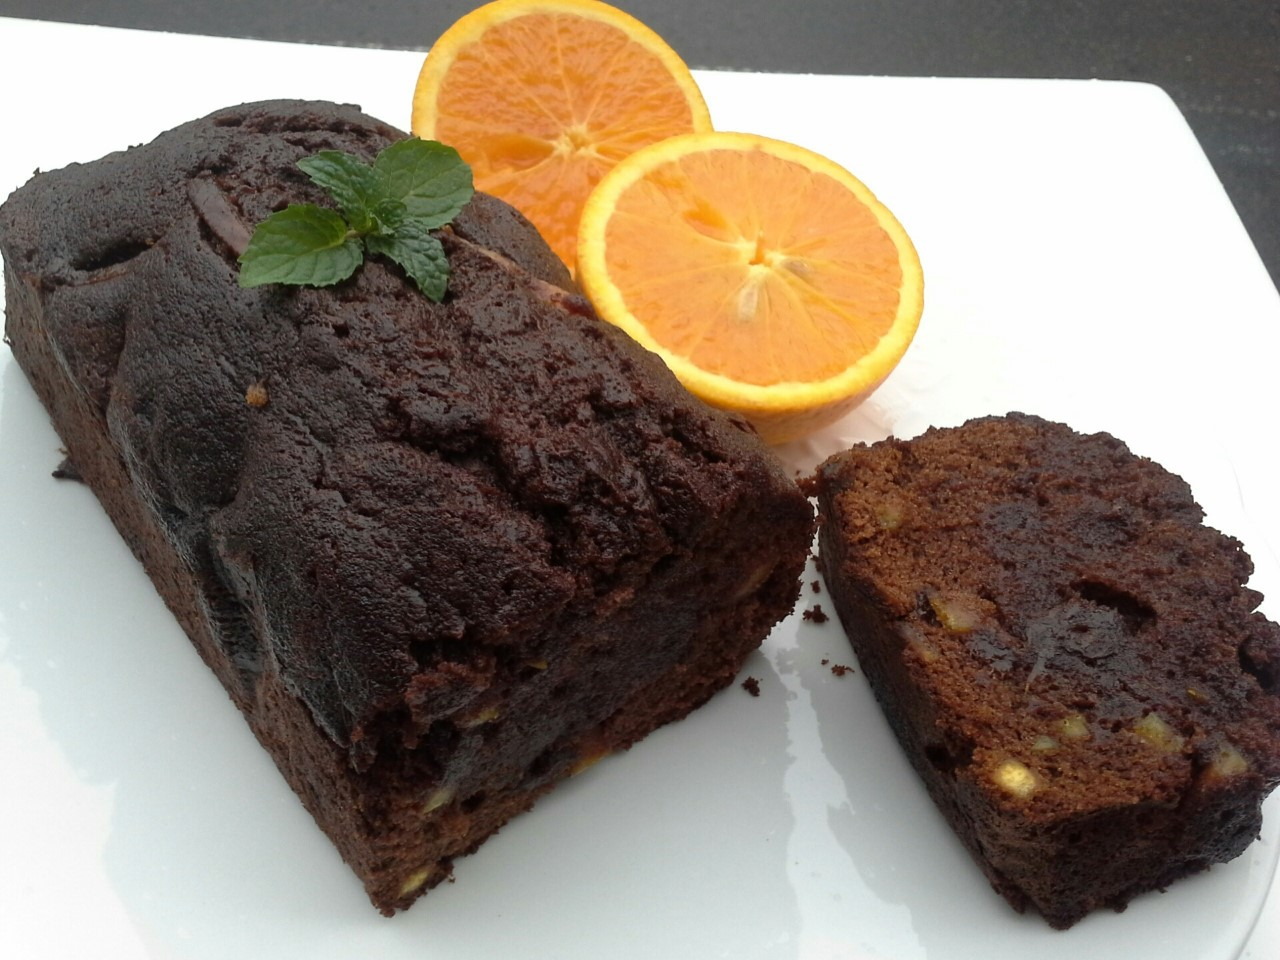 【Honeys 】巧克力橙香橘子磅蛋糕 (450g) 法國進口100%法芙娜巧克力